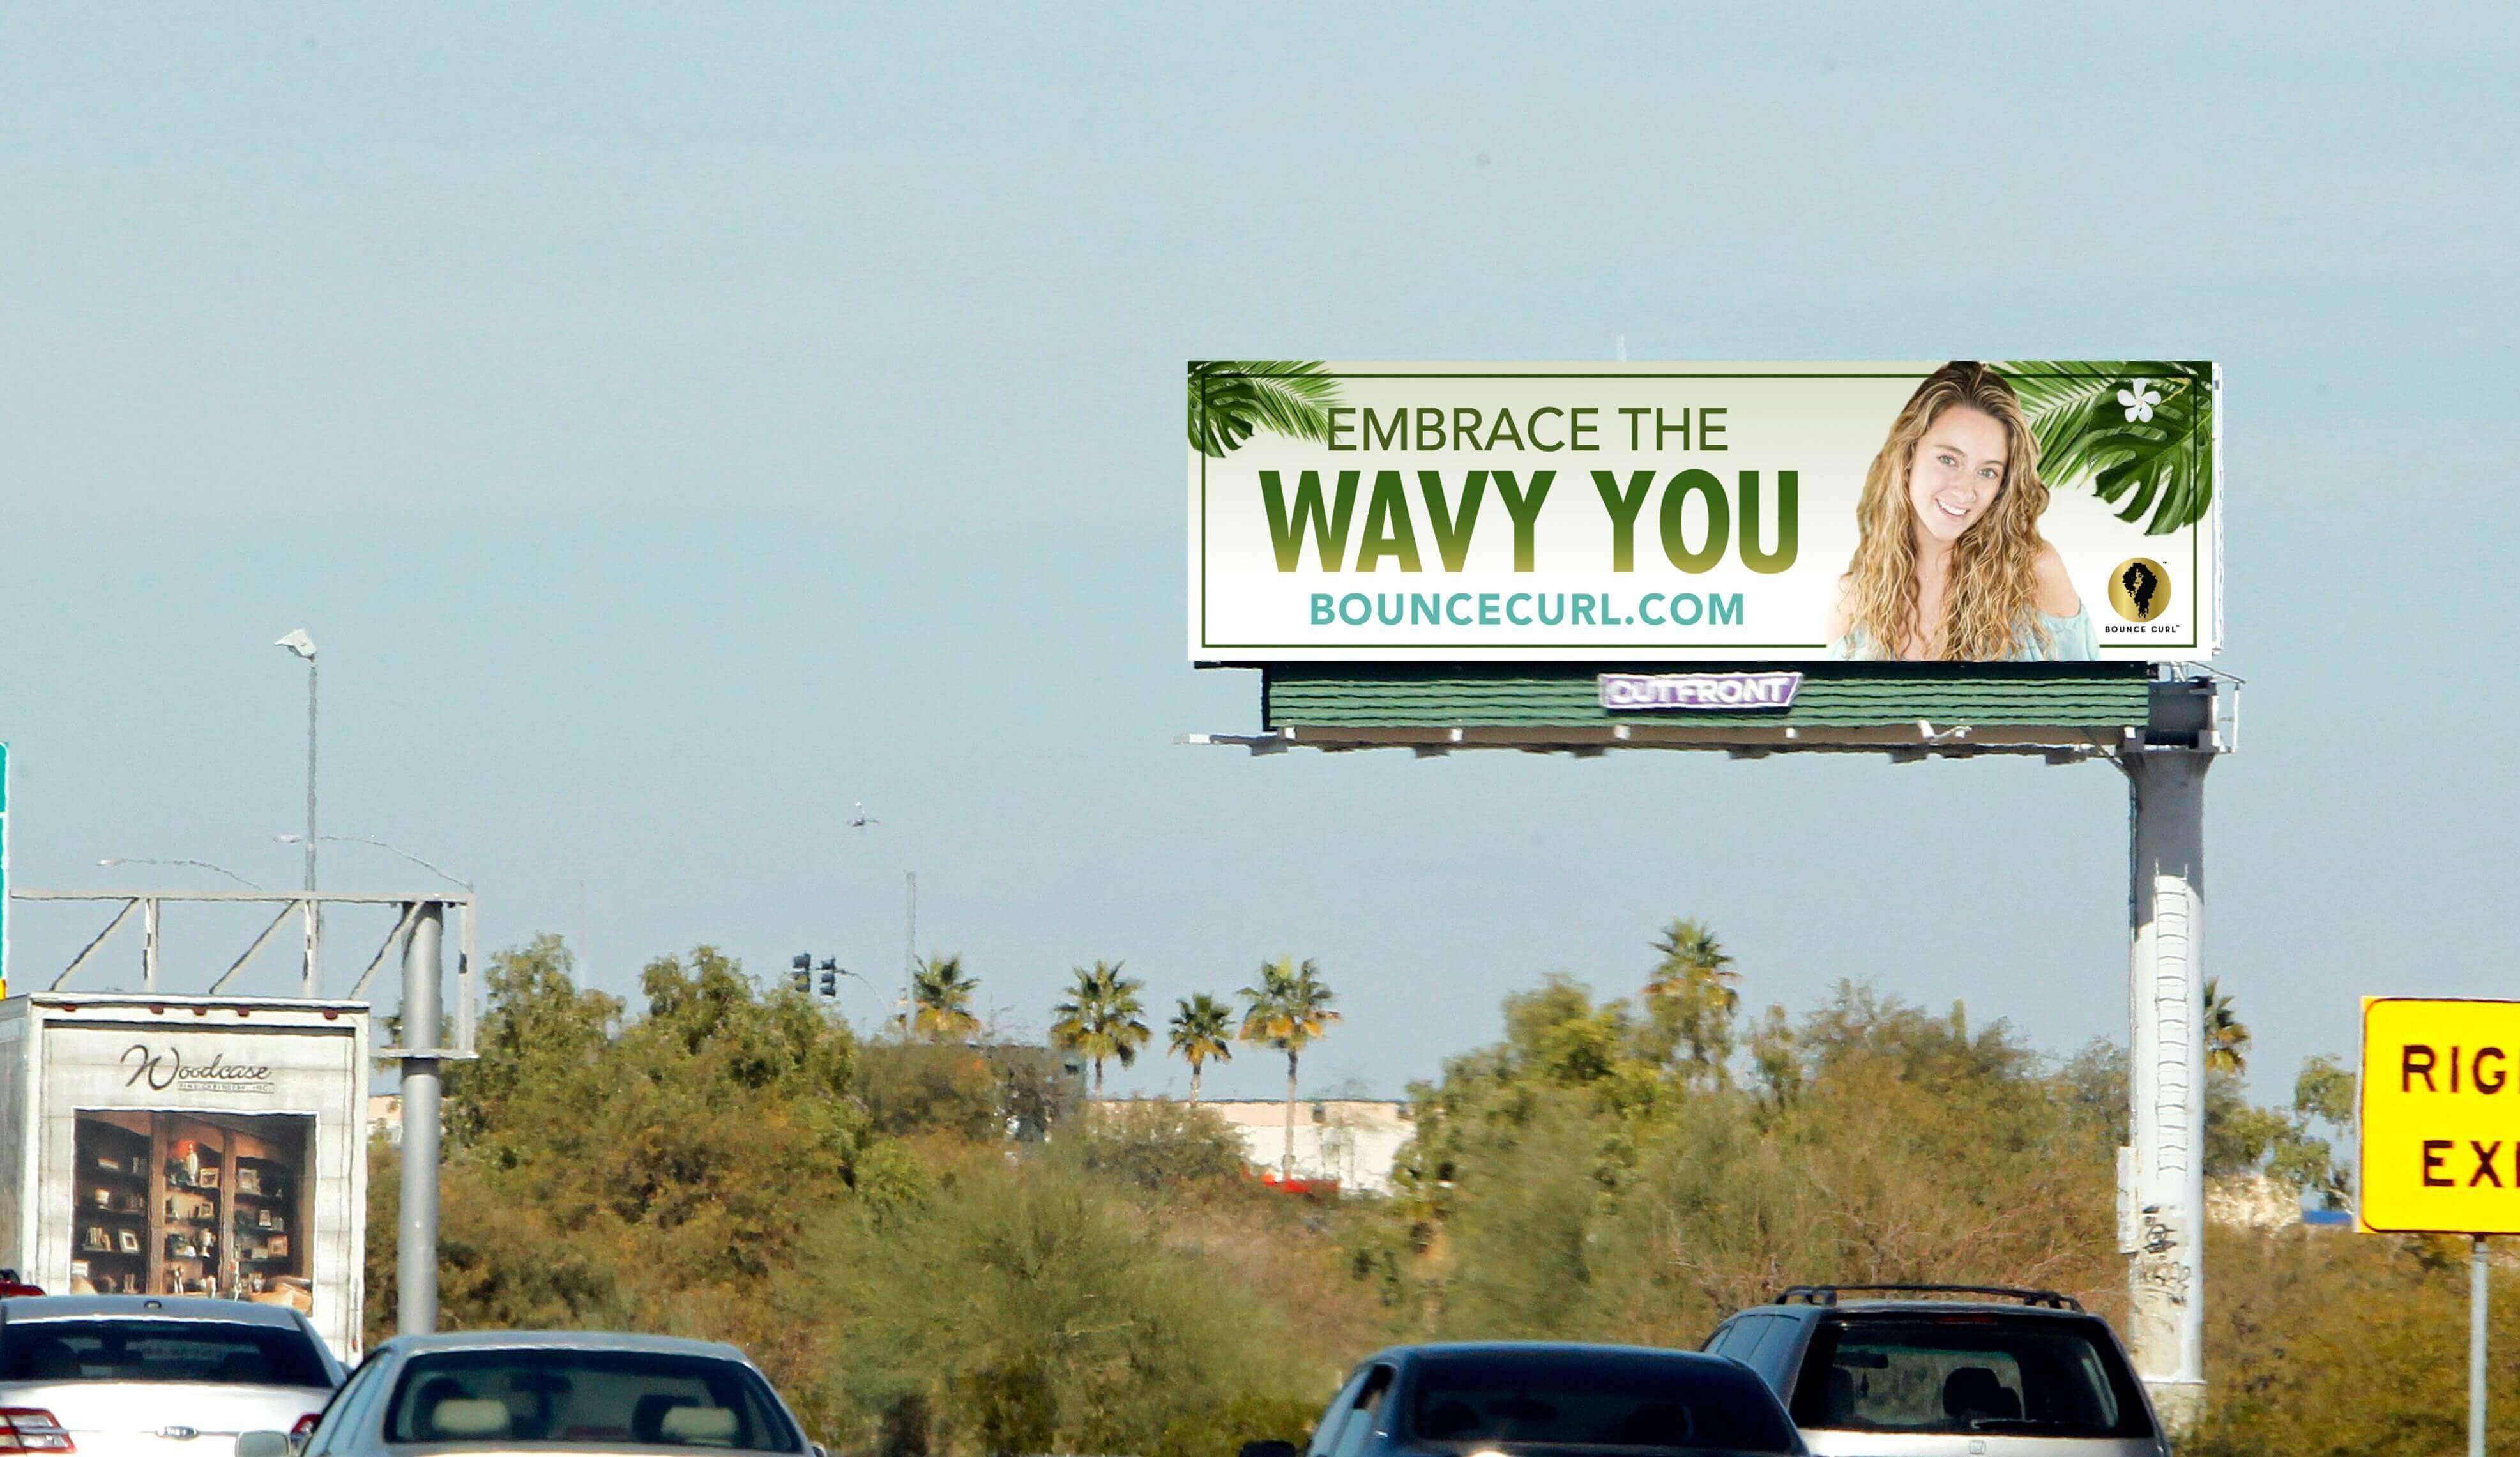 Phoenix Bounce Curl 2-8582 appBounce Curl Billboard creative for wavy hair